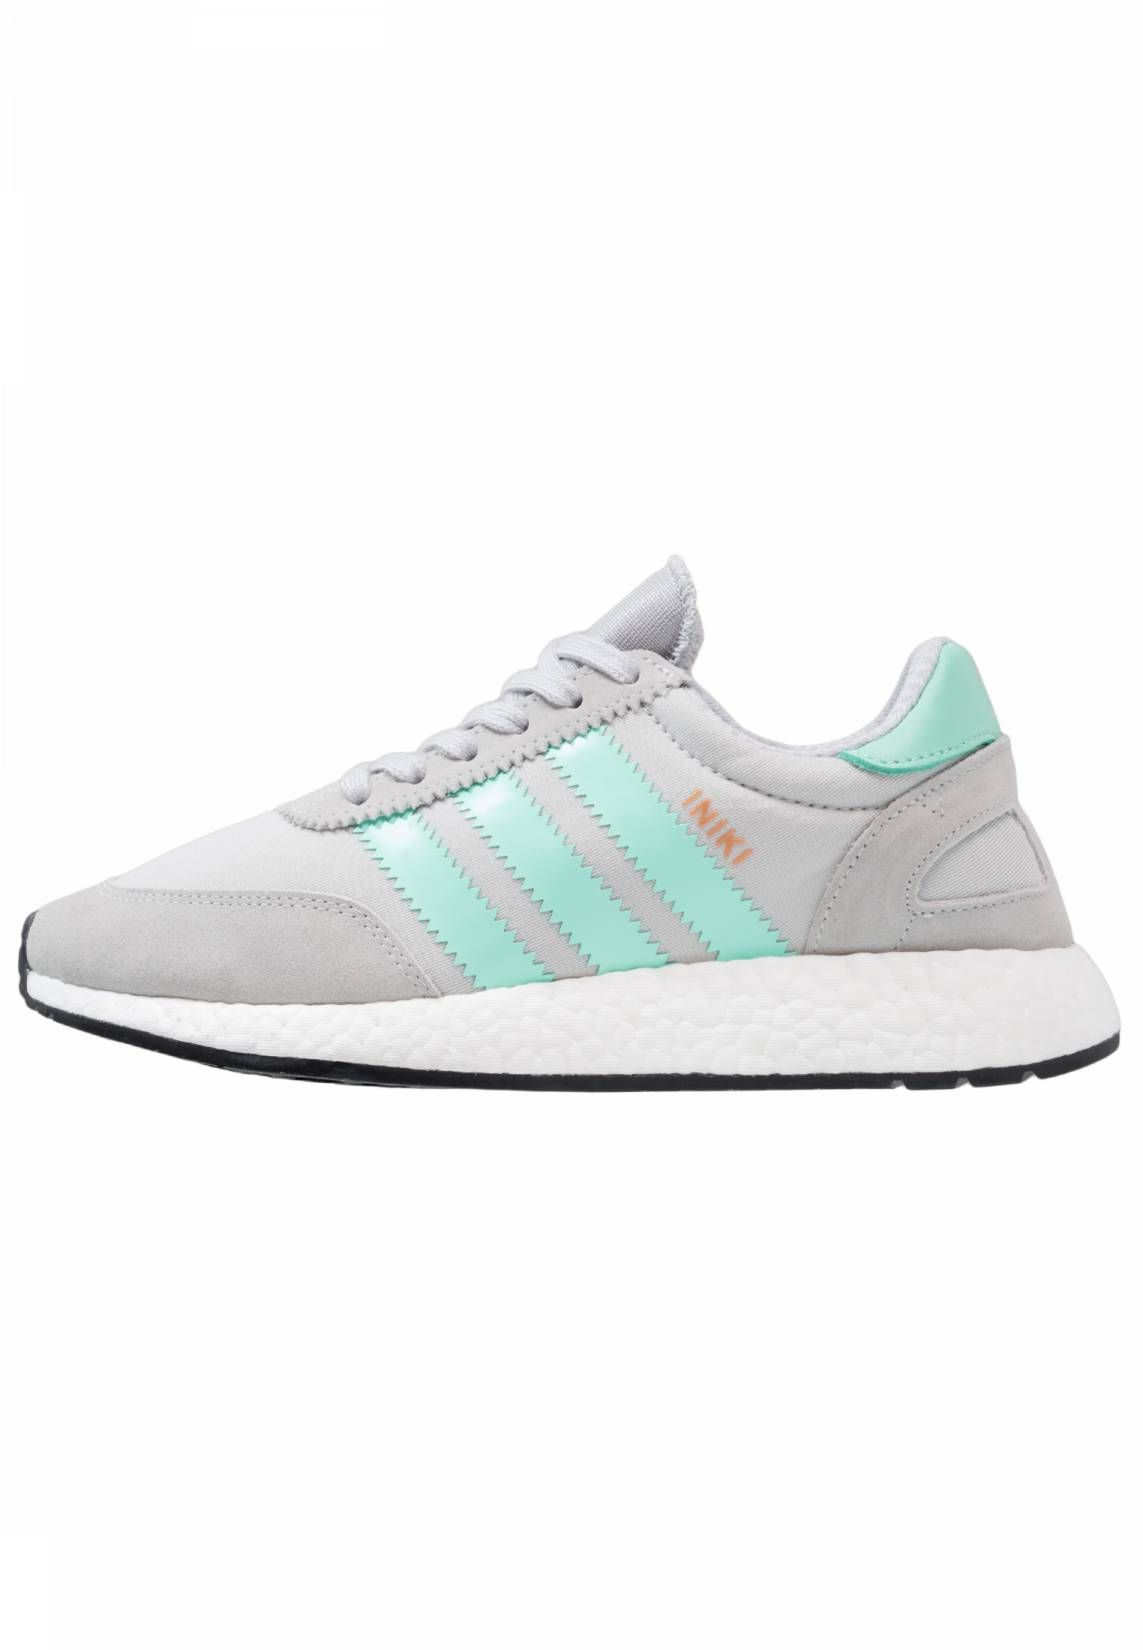 adidas Originals. INIKI RUNNER Trainers light solid grey